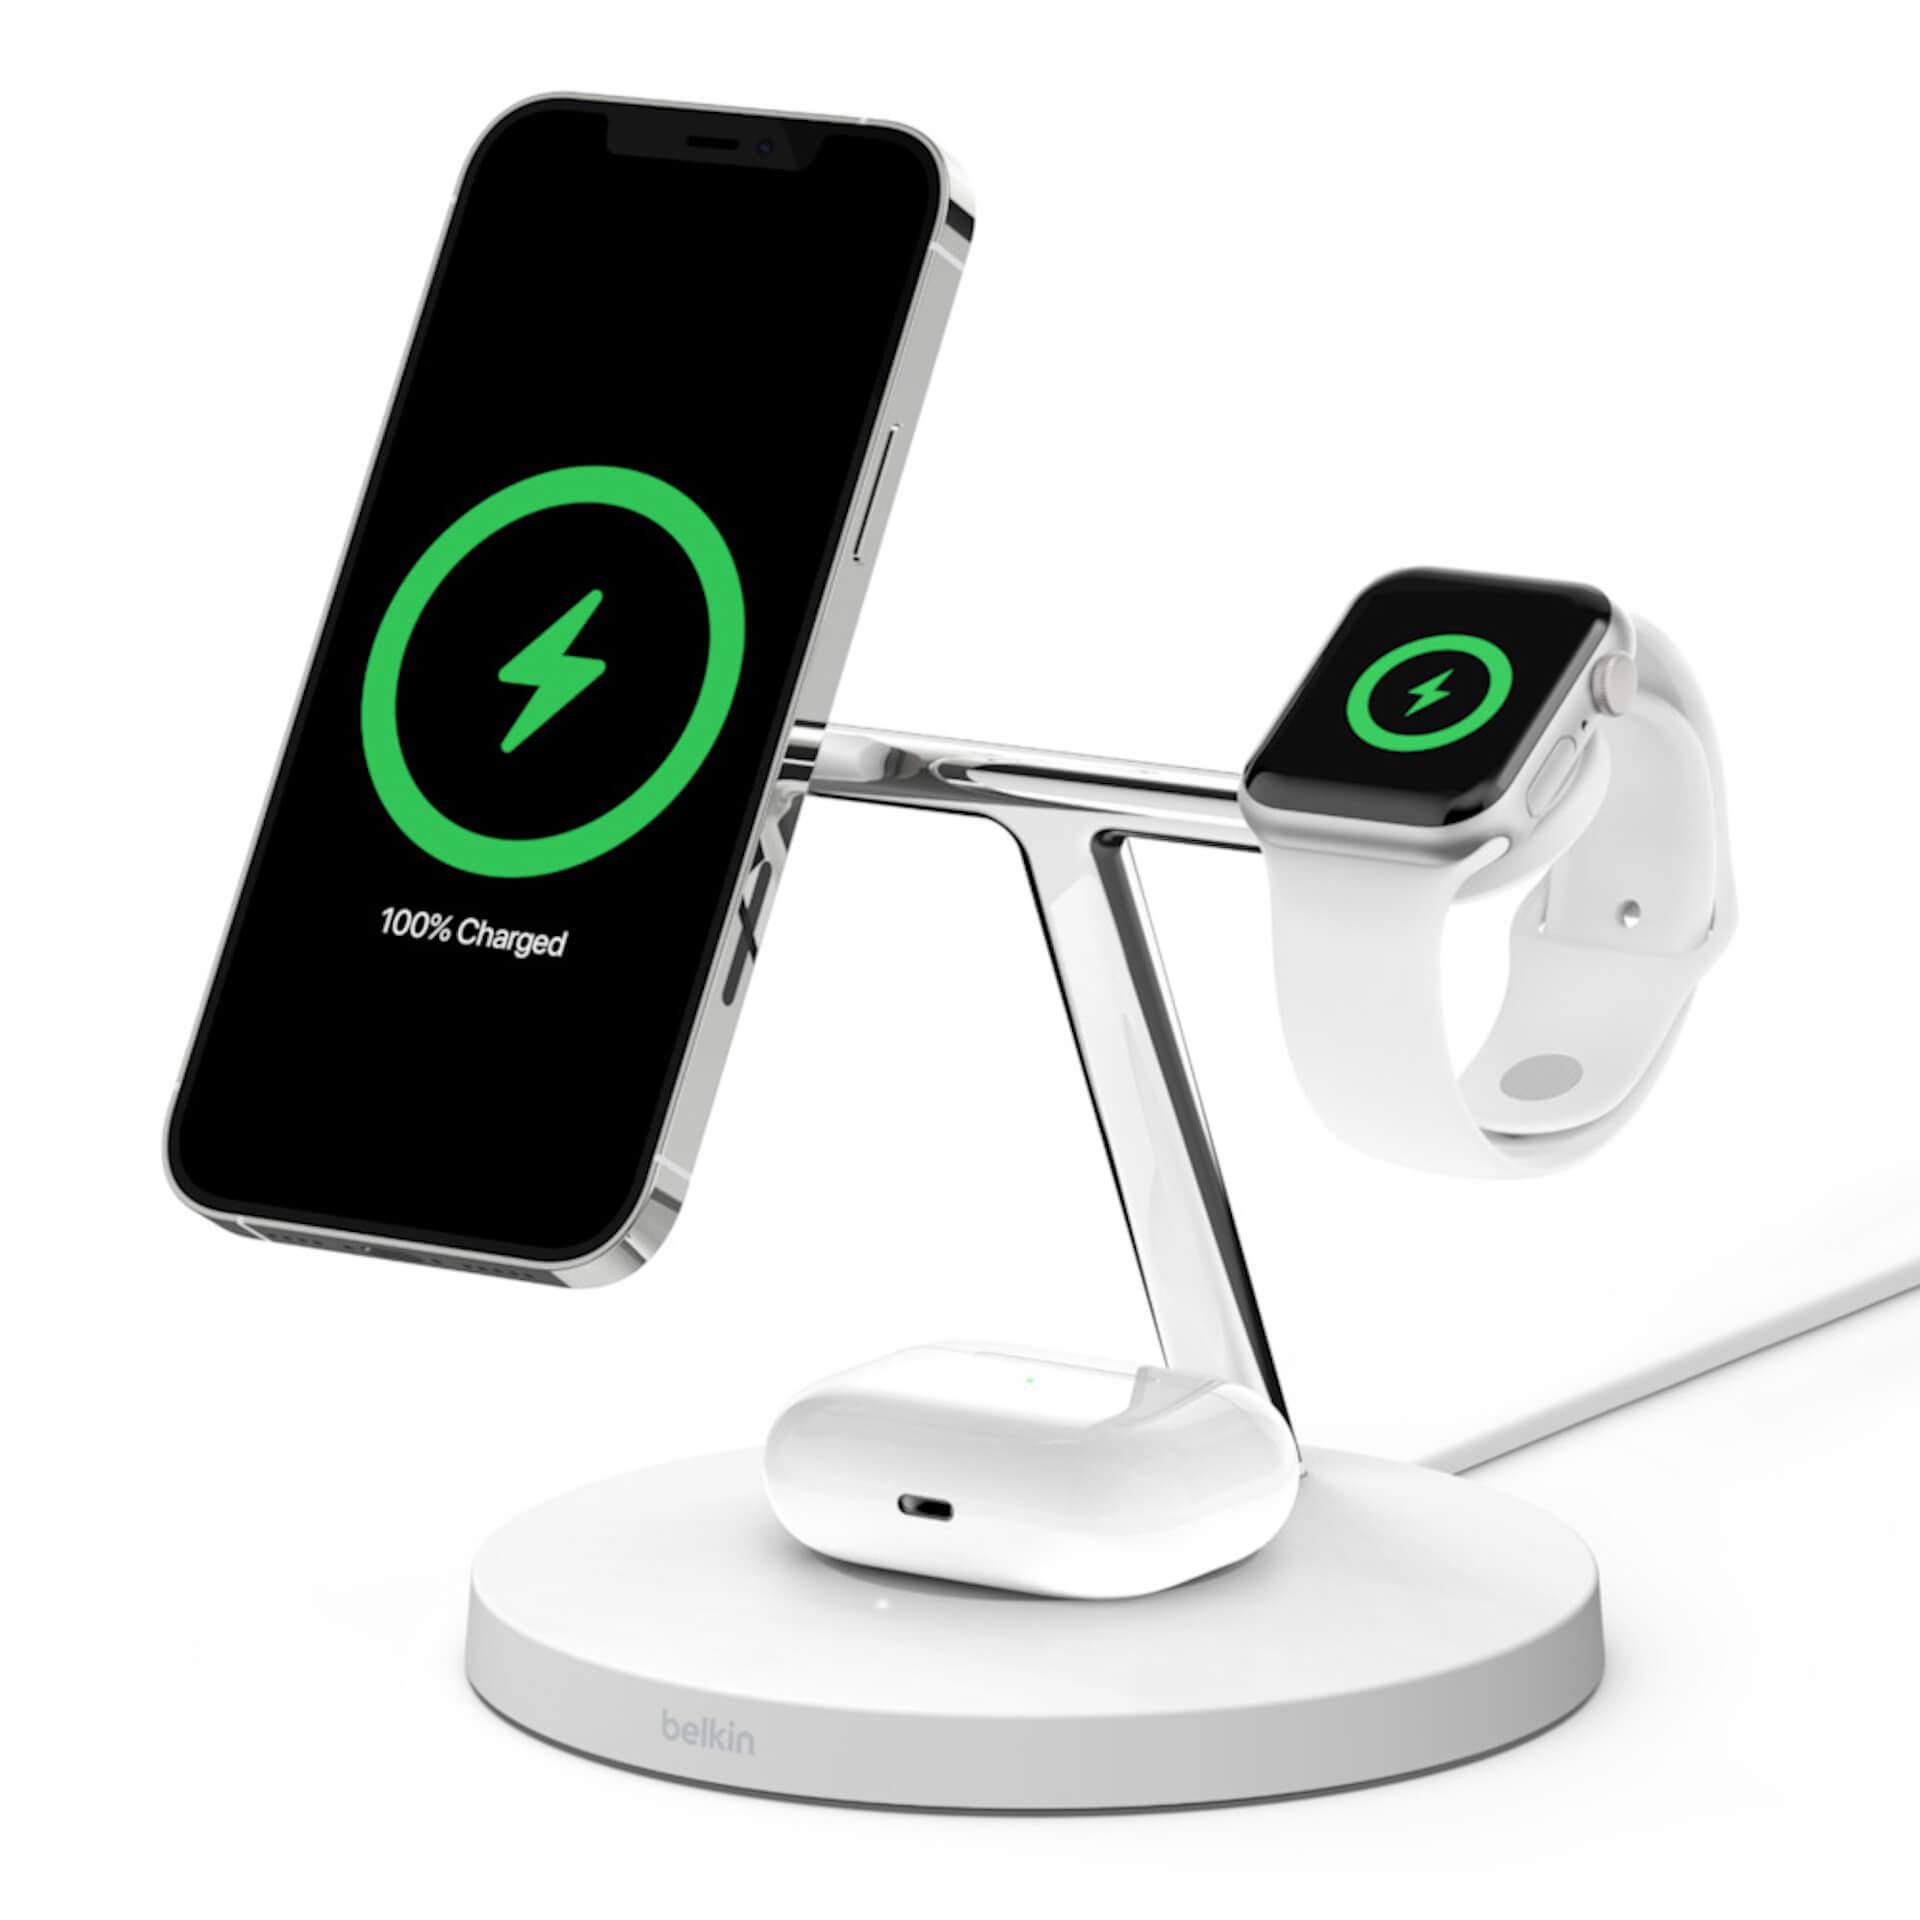 BelkinからiPhone 12シリーズに対応した高機能製品3点が発売!MagSafeを利用した3-in-1のワイヤレス充電器などが登場 tech210120_magsafe_belkin_3